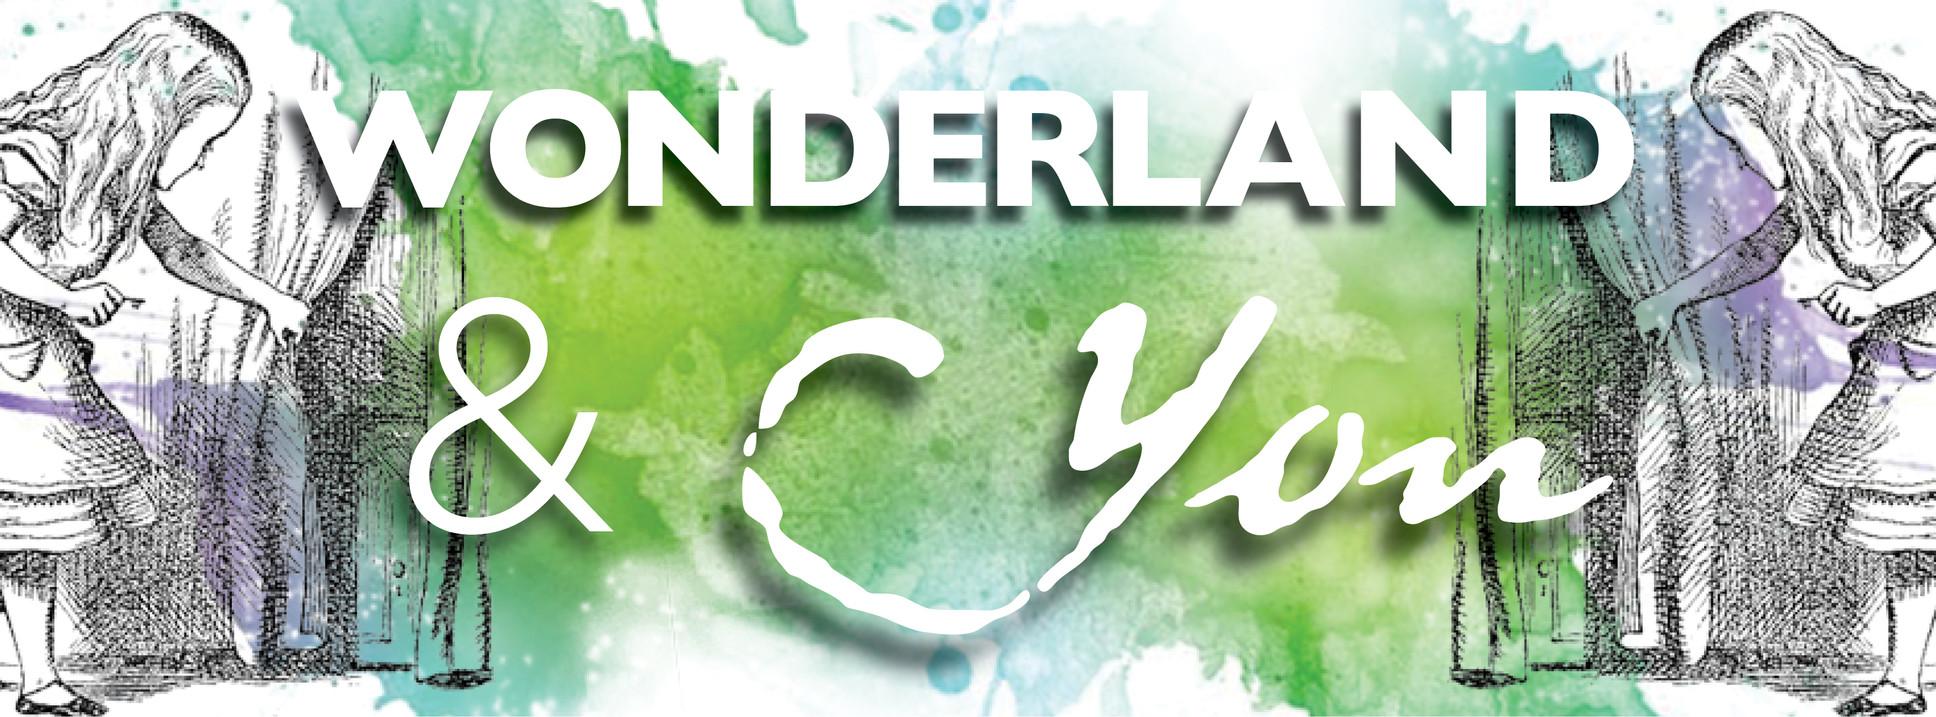 Wonderland_CoverPhoto_Final.jpg